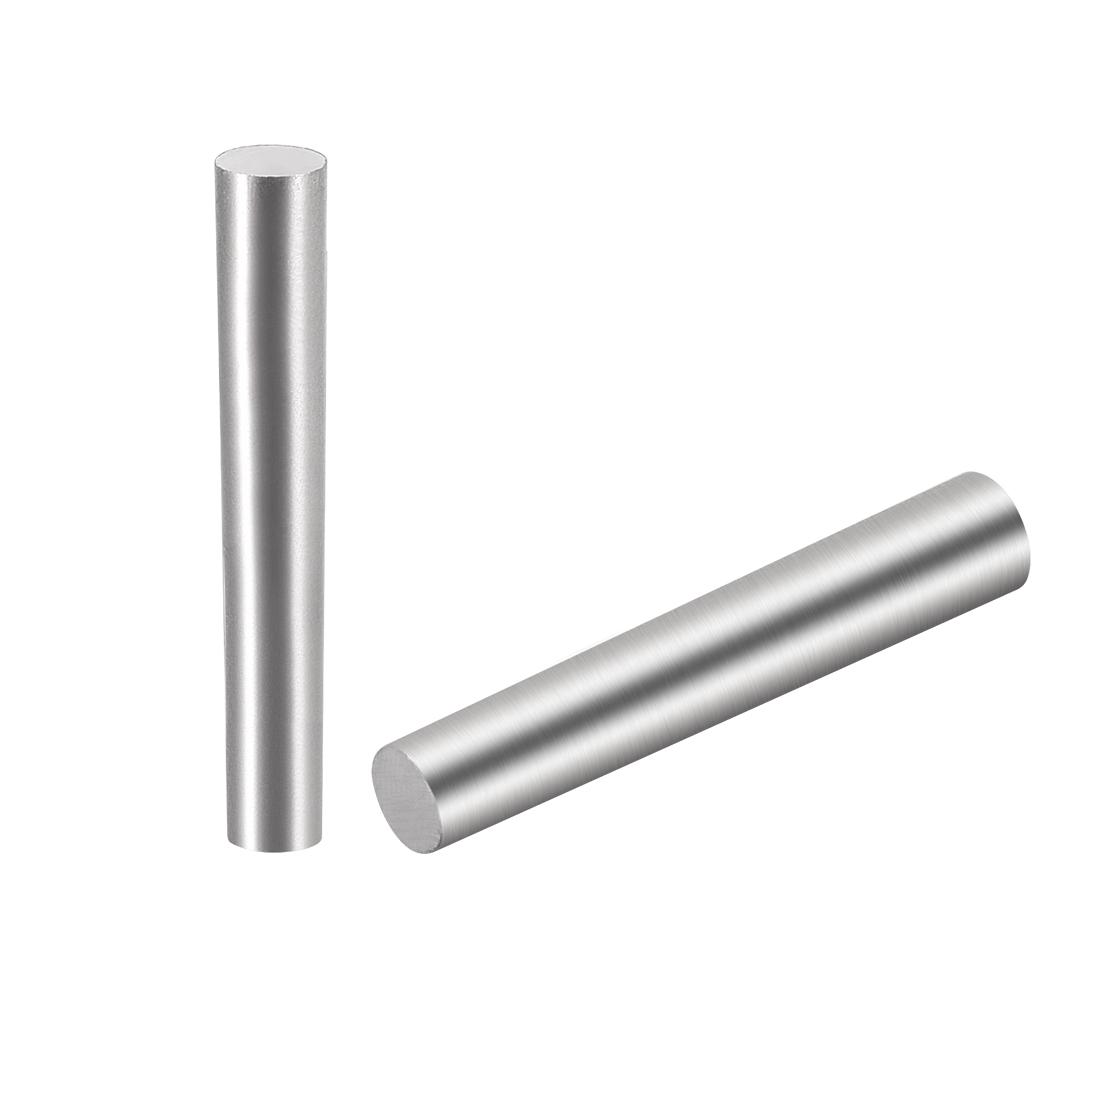 2Pcs 4mm x 35mm 1:50 Taper Pin 304 Stainless Steel Shelf Support Pin Fasten